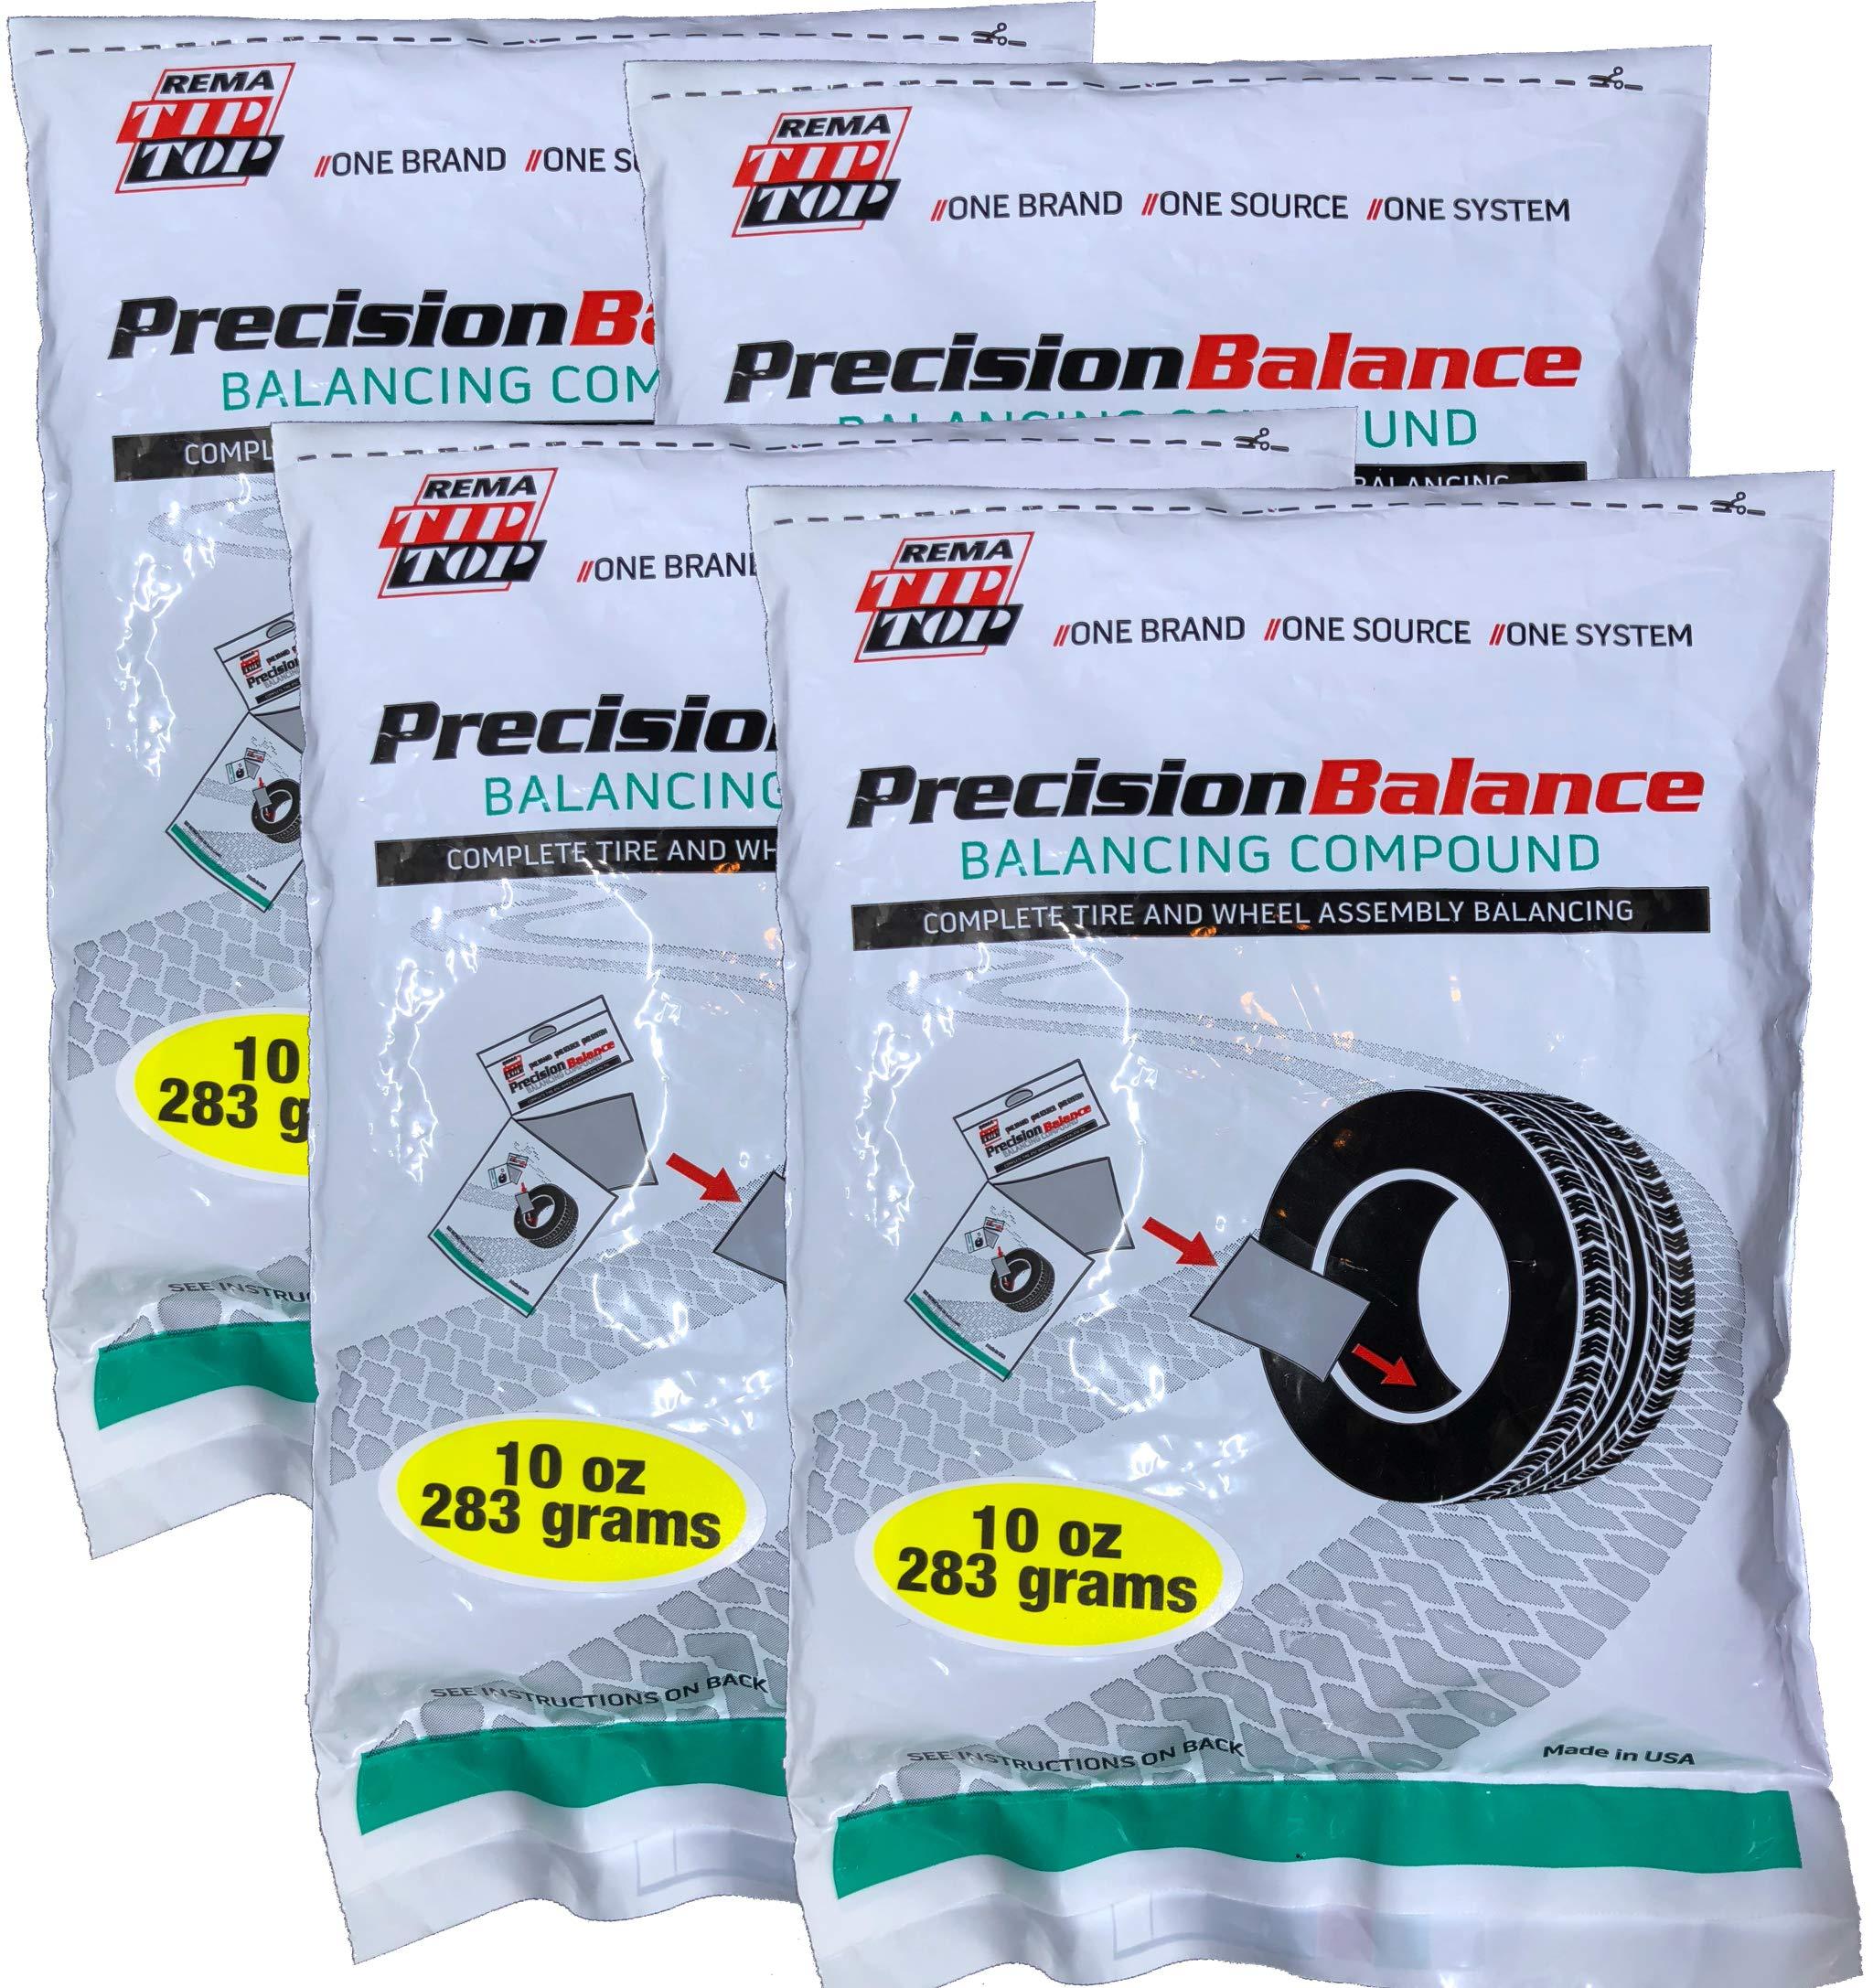 Drop in Bags - 4 Kits 5 oz. // 142 Grams Rema Tip Top 4 PrecisionBalance Tire Balancing Compound Beads Kits -